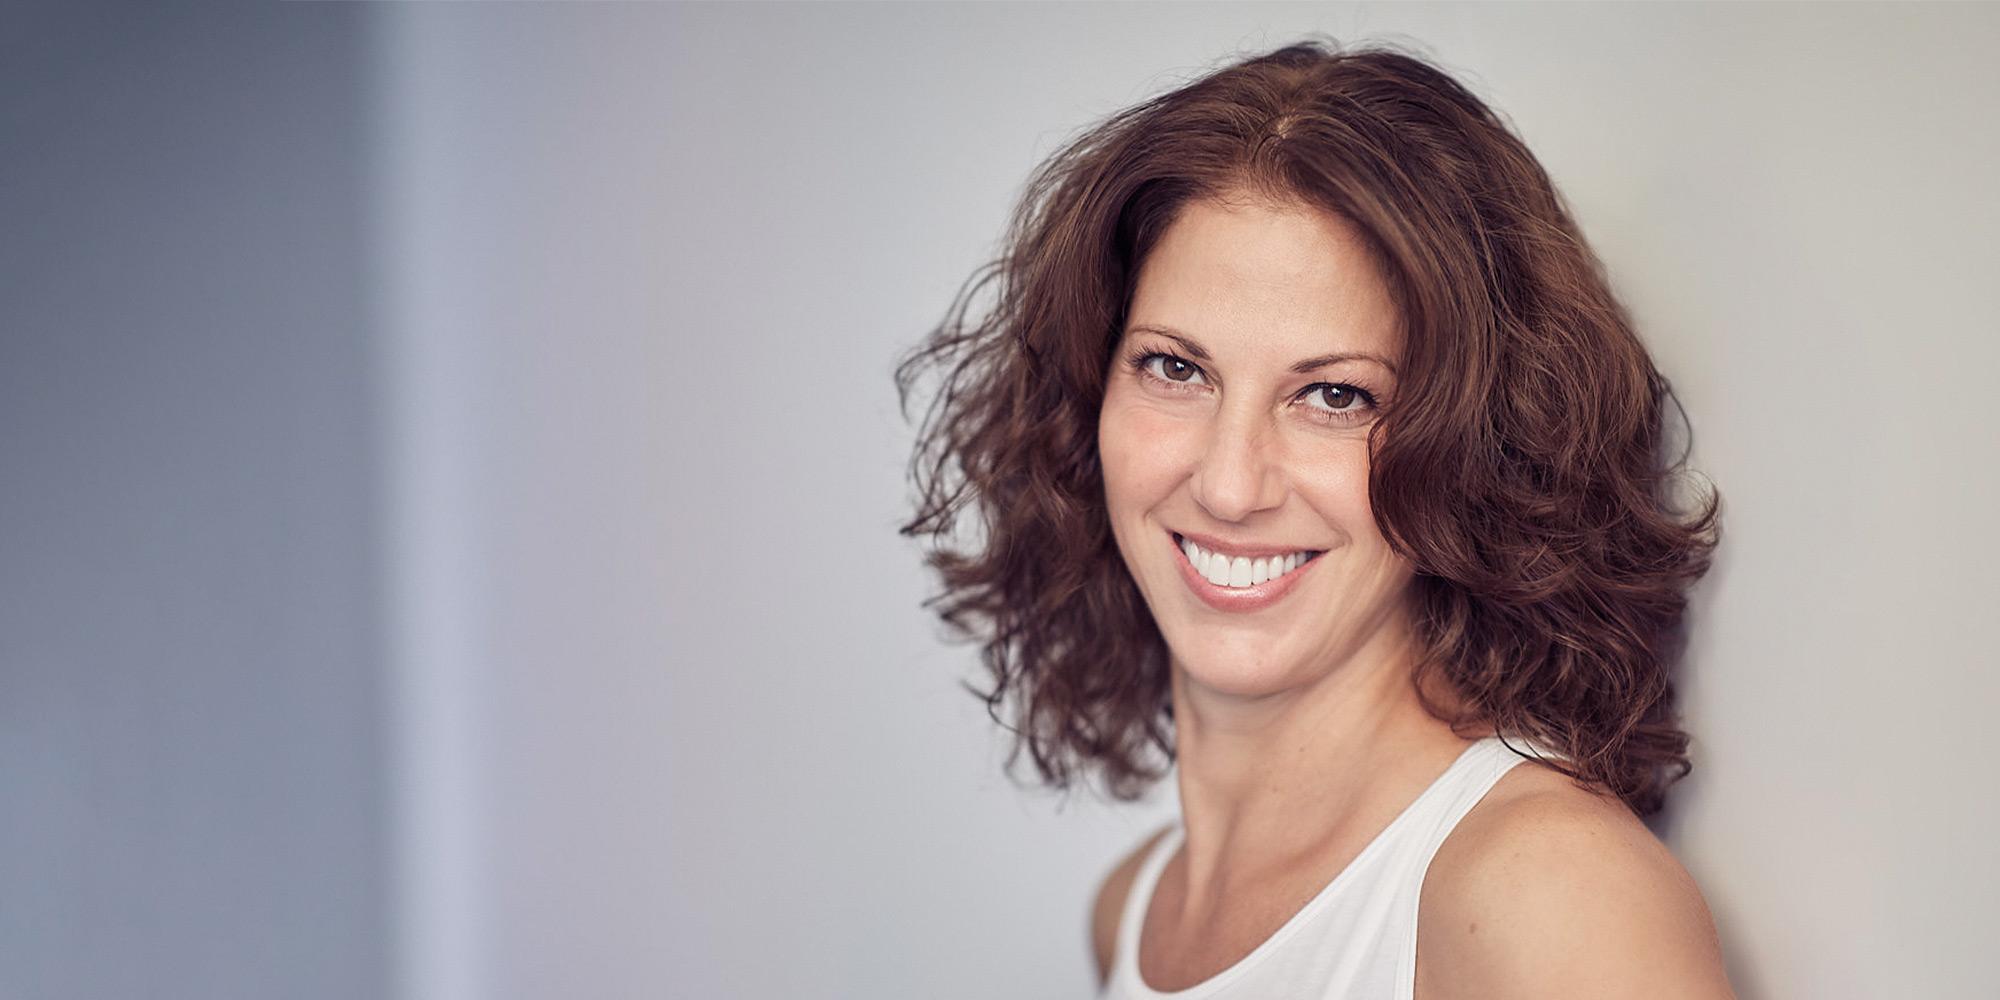 Michaela Hölzle, Yoga-Lehrerin aus Neuss